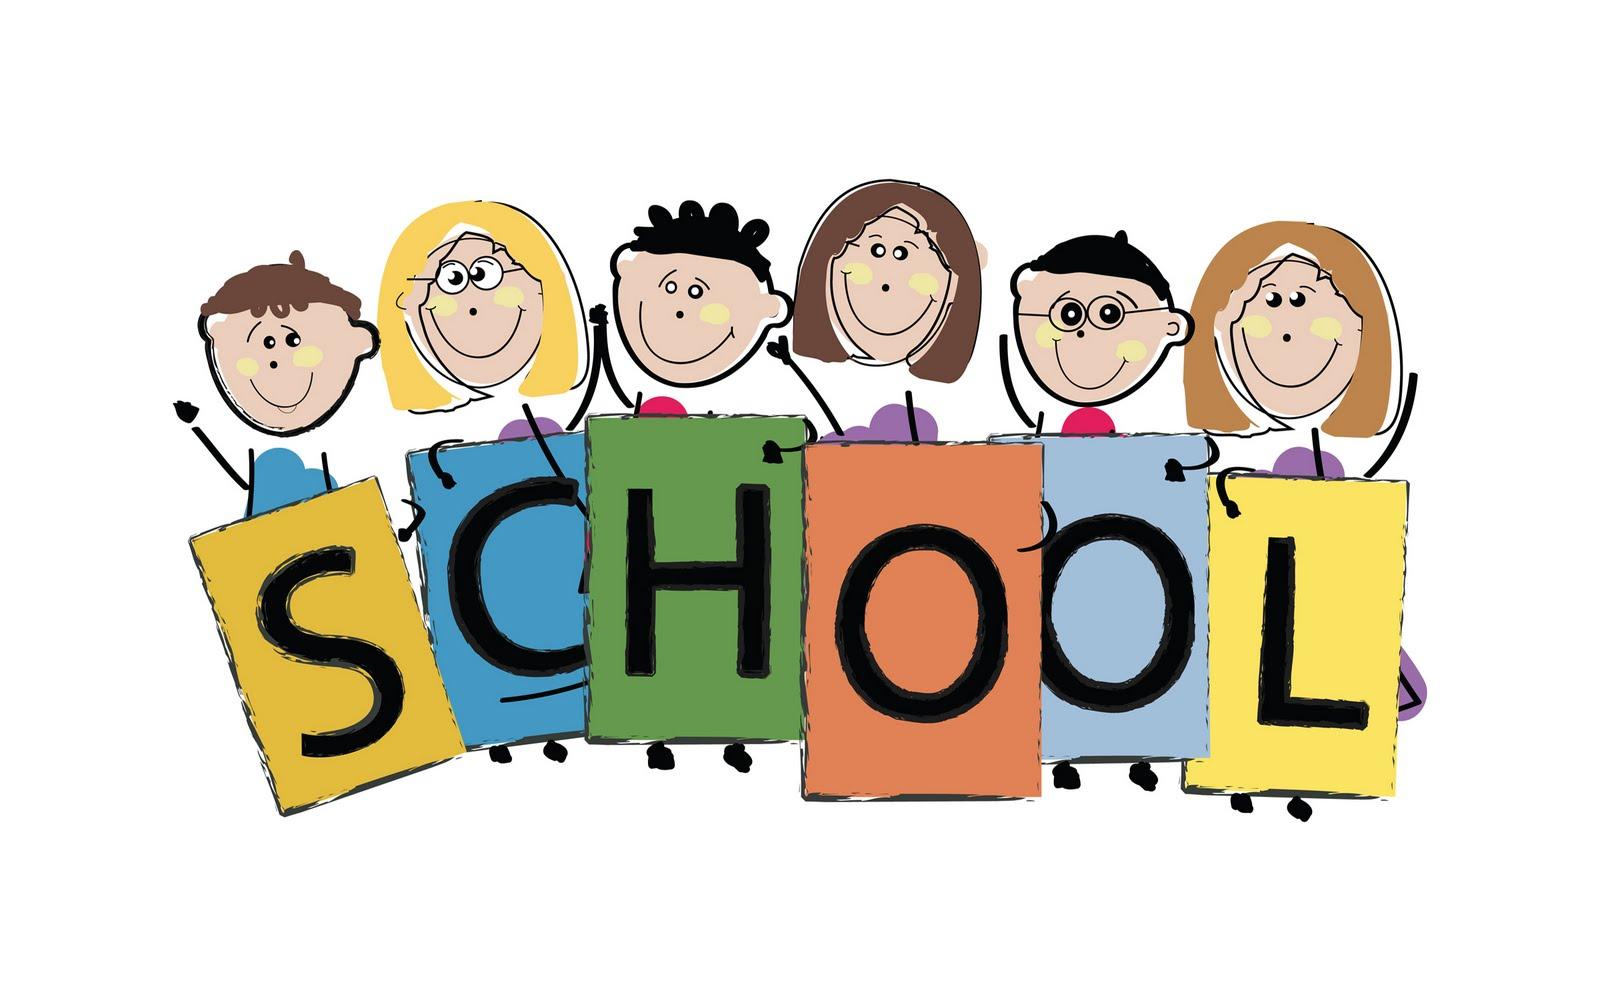 стихи на английском для детей про школу